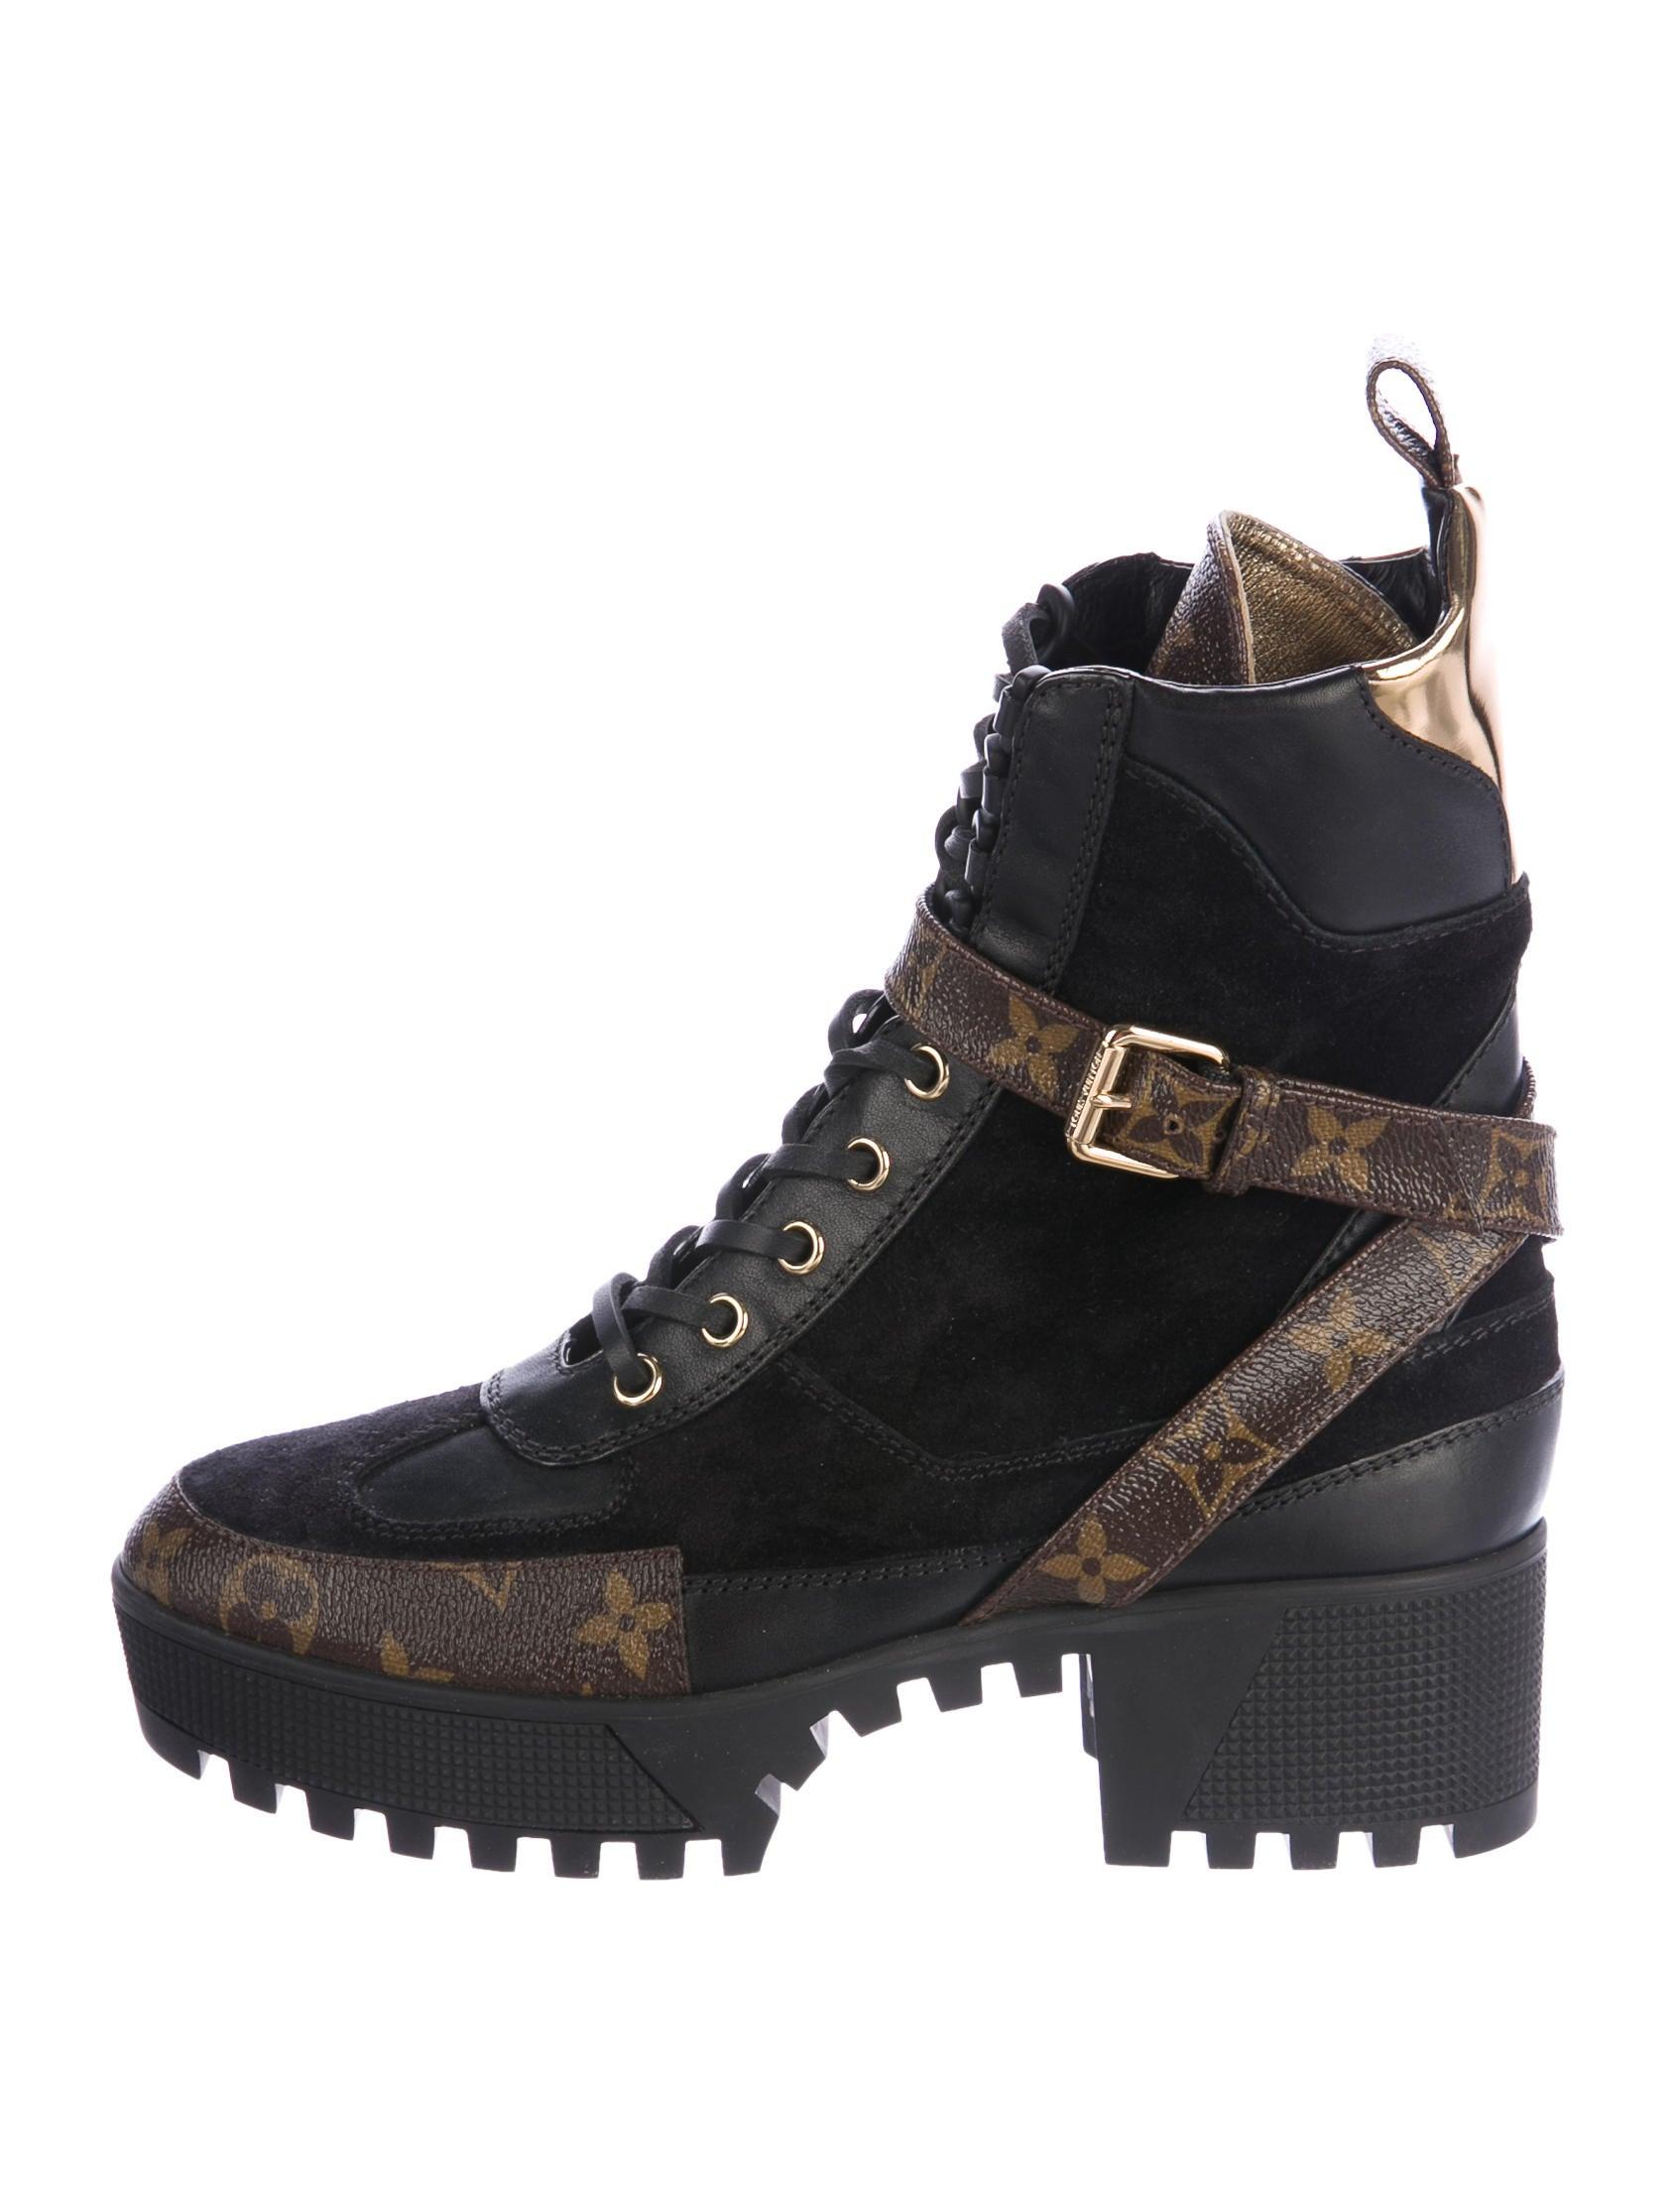 3e236a5ad37d LV LAUREATE 2 DESERT BOOT Source · Louis Vuitton 2017 Laureate Platform Desert  Boots Shoes